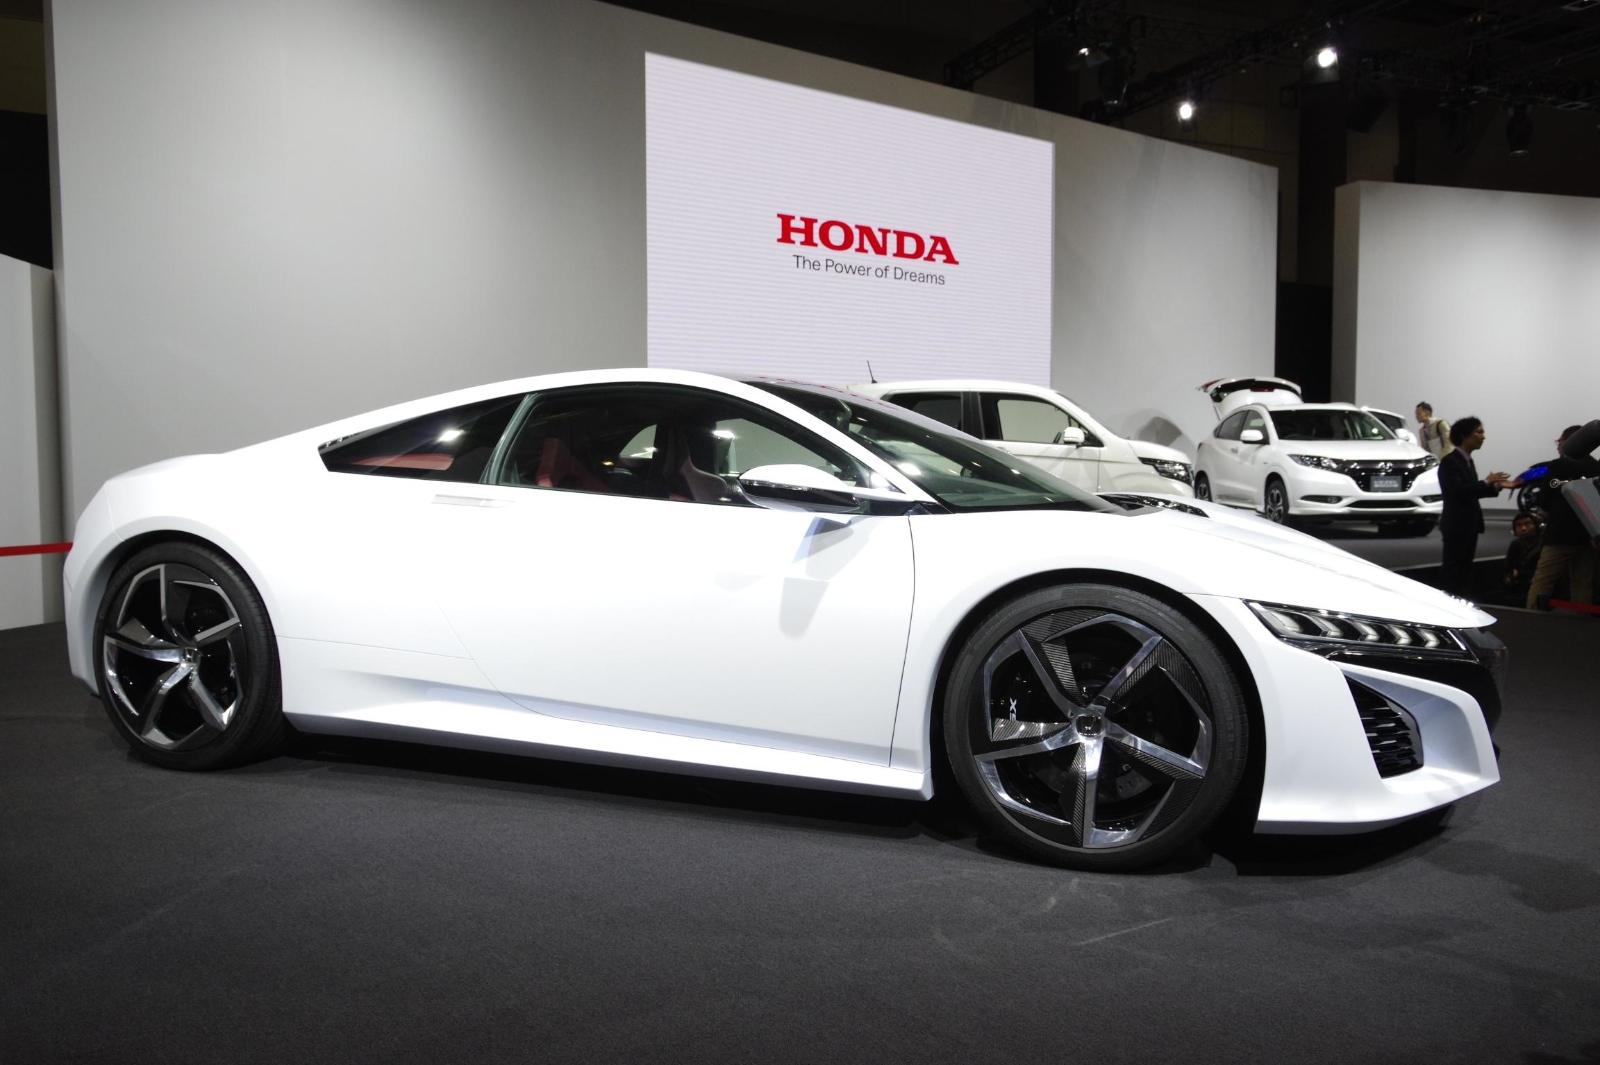 Acura Tlx Hybrid >> Tokyo 2013: Honda NSX Concept in White [Live Photos ...